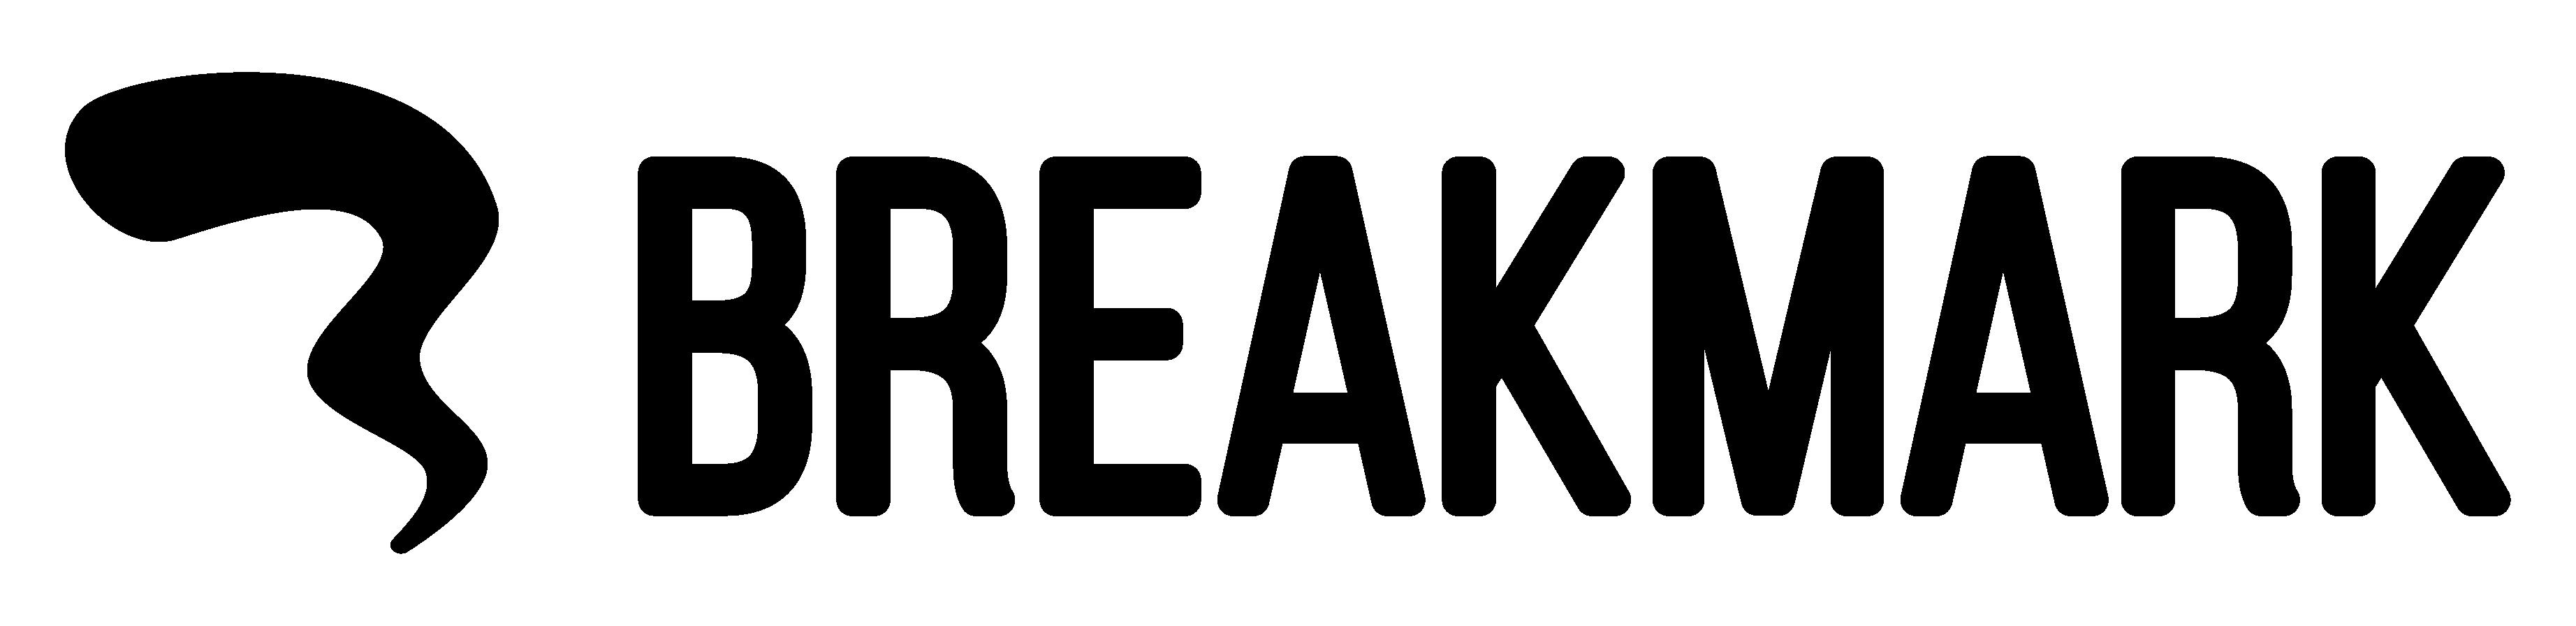 breakmark-logo.png